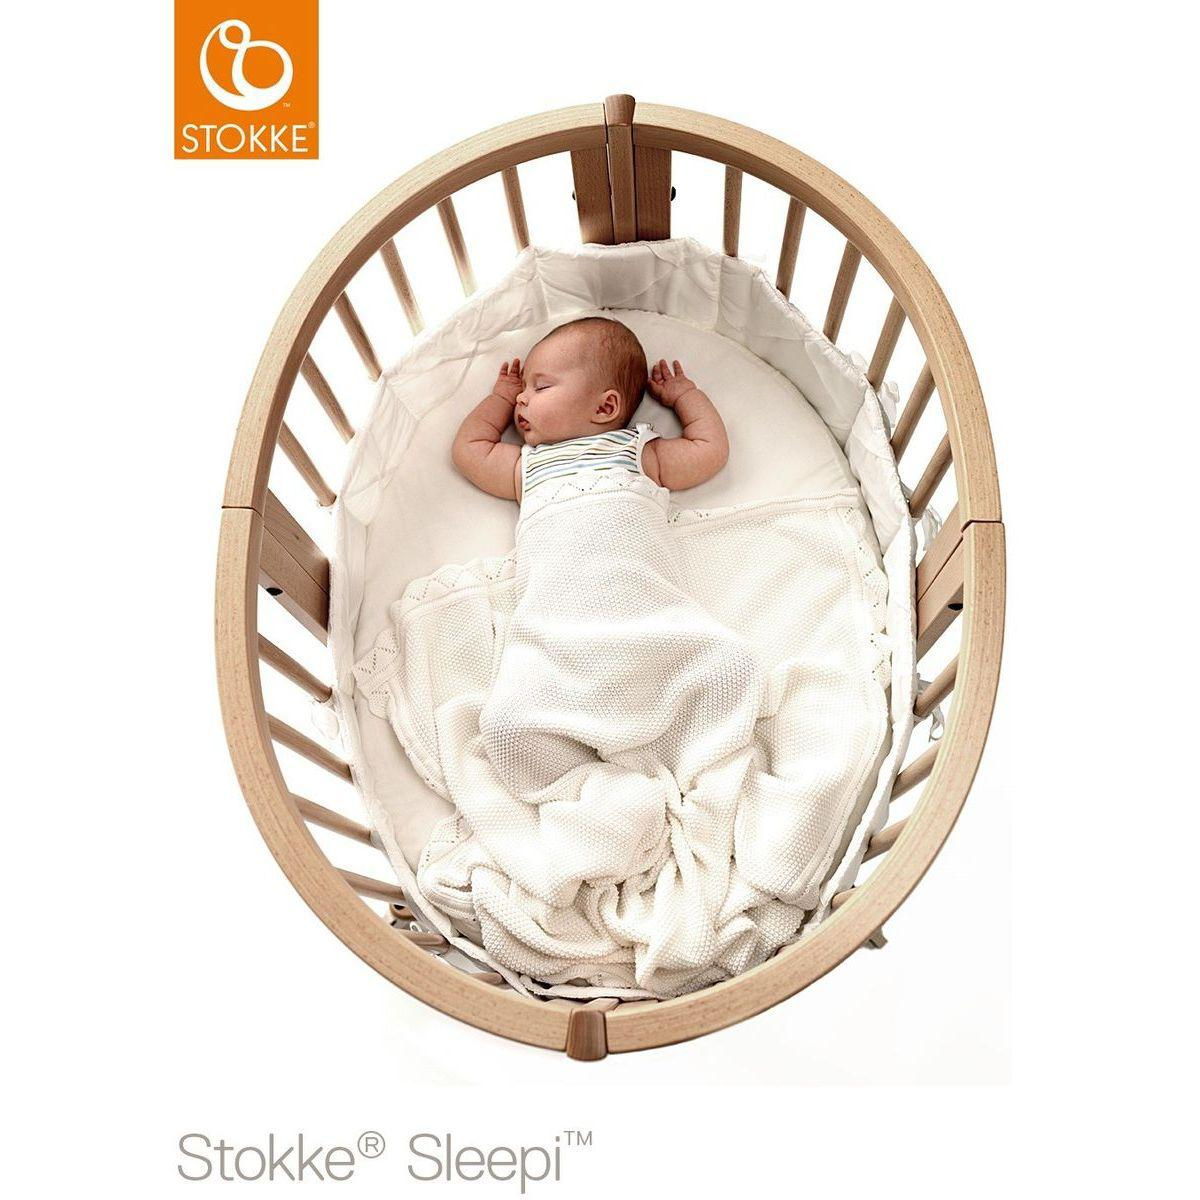 Berceau-lit bébé mini SLEEPI Stokke gris brume